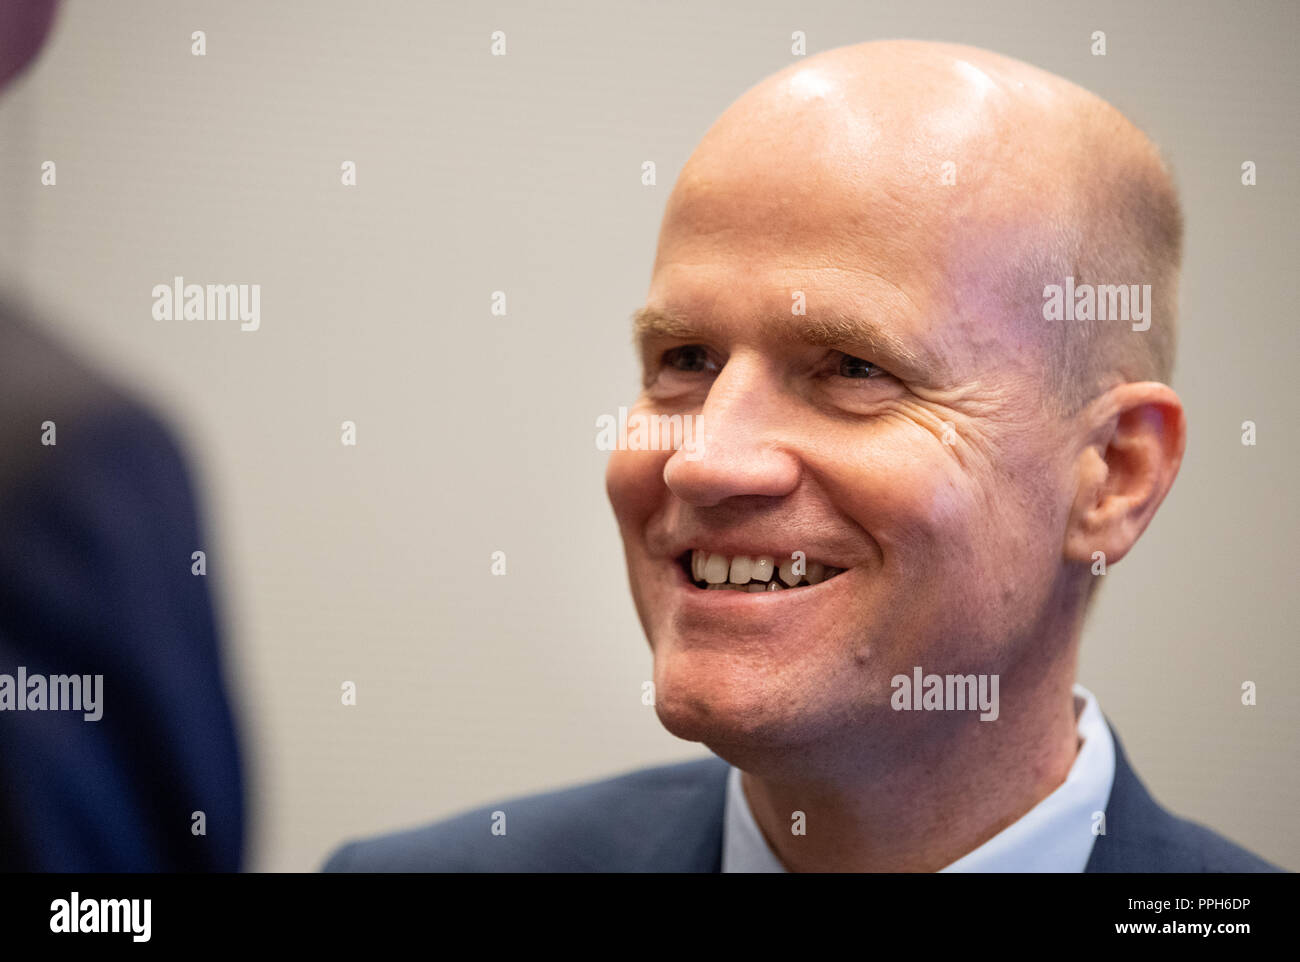 26 September 2018, Berlin: Ralph Brinkhaus (CDU), leader of the parliamentary group, arrives at an event 'Heimat mit Zukunft'- für starken ländliche Regionen' in the session hall of the CDU/CSU parliamentary group in the Bundestag. Photo: Fabian Sommer/dpa - Stock Image